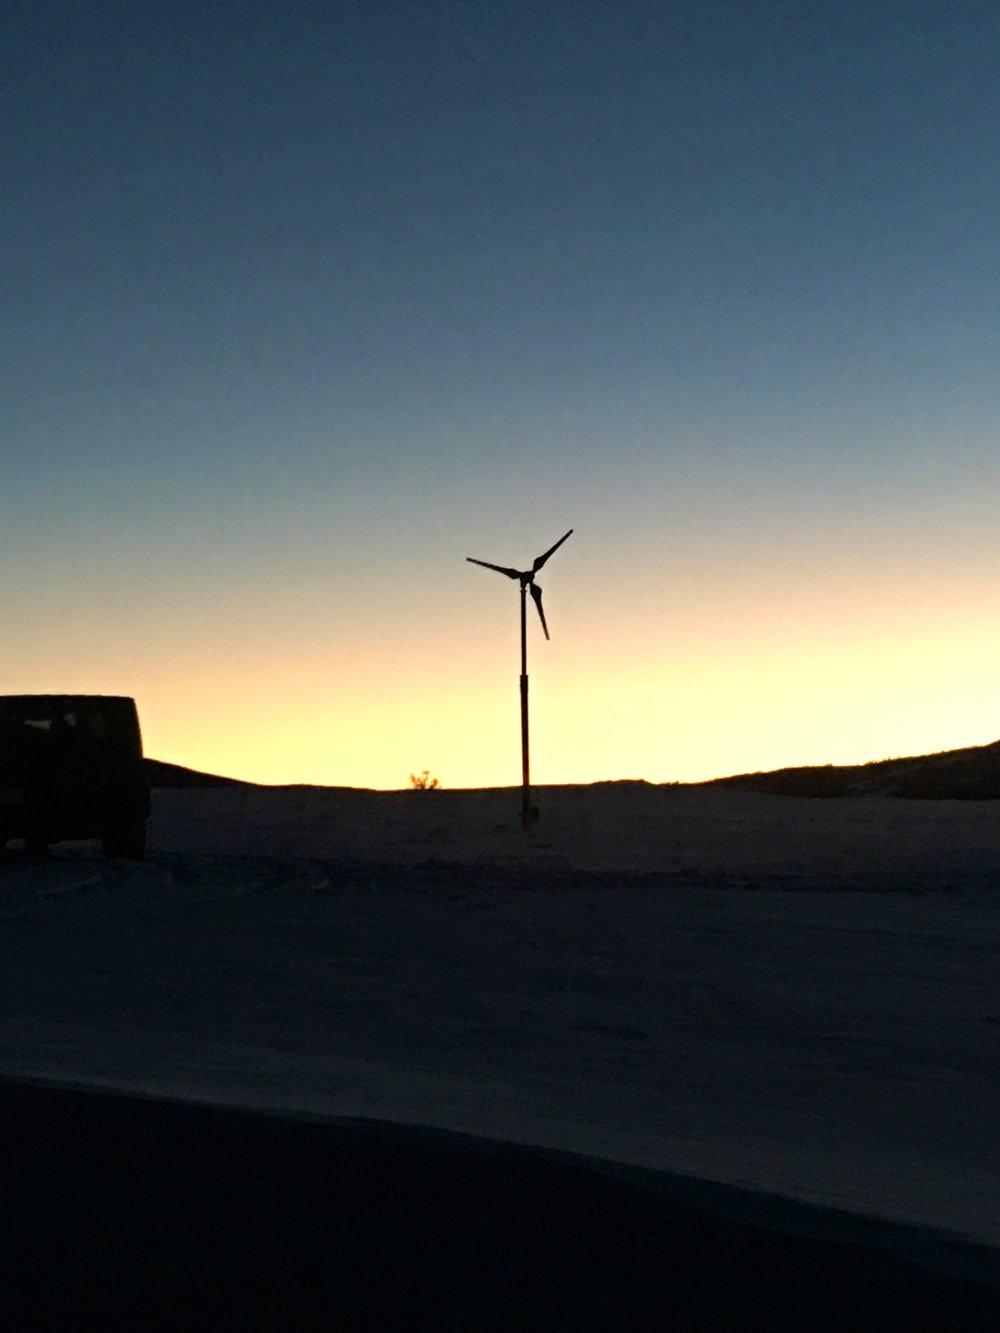 Sun sets behind the wind turbine